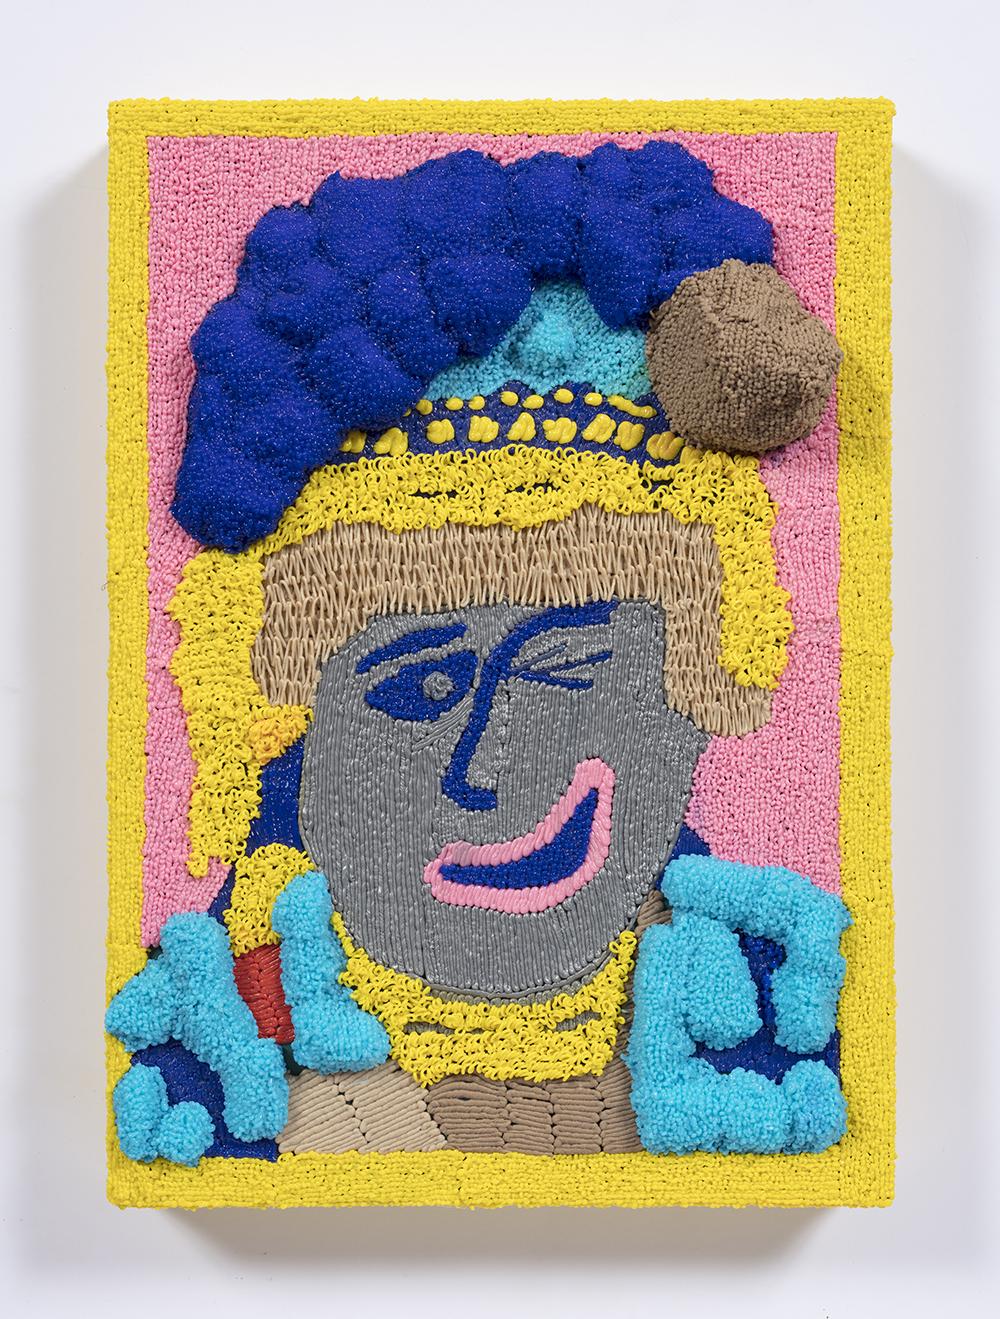 Dominic Dispirito. <em>Oi oi saveloyyyyy</em>, 2018. Manually printed PLA plastic on board, 11 3/4 x 8 1/4 inches  (30 x 21 cm)